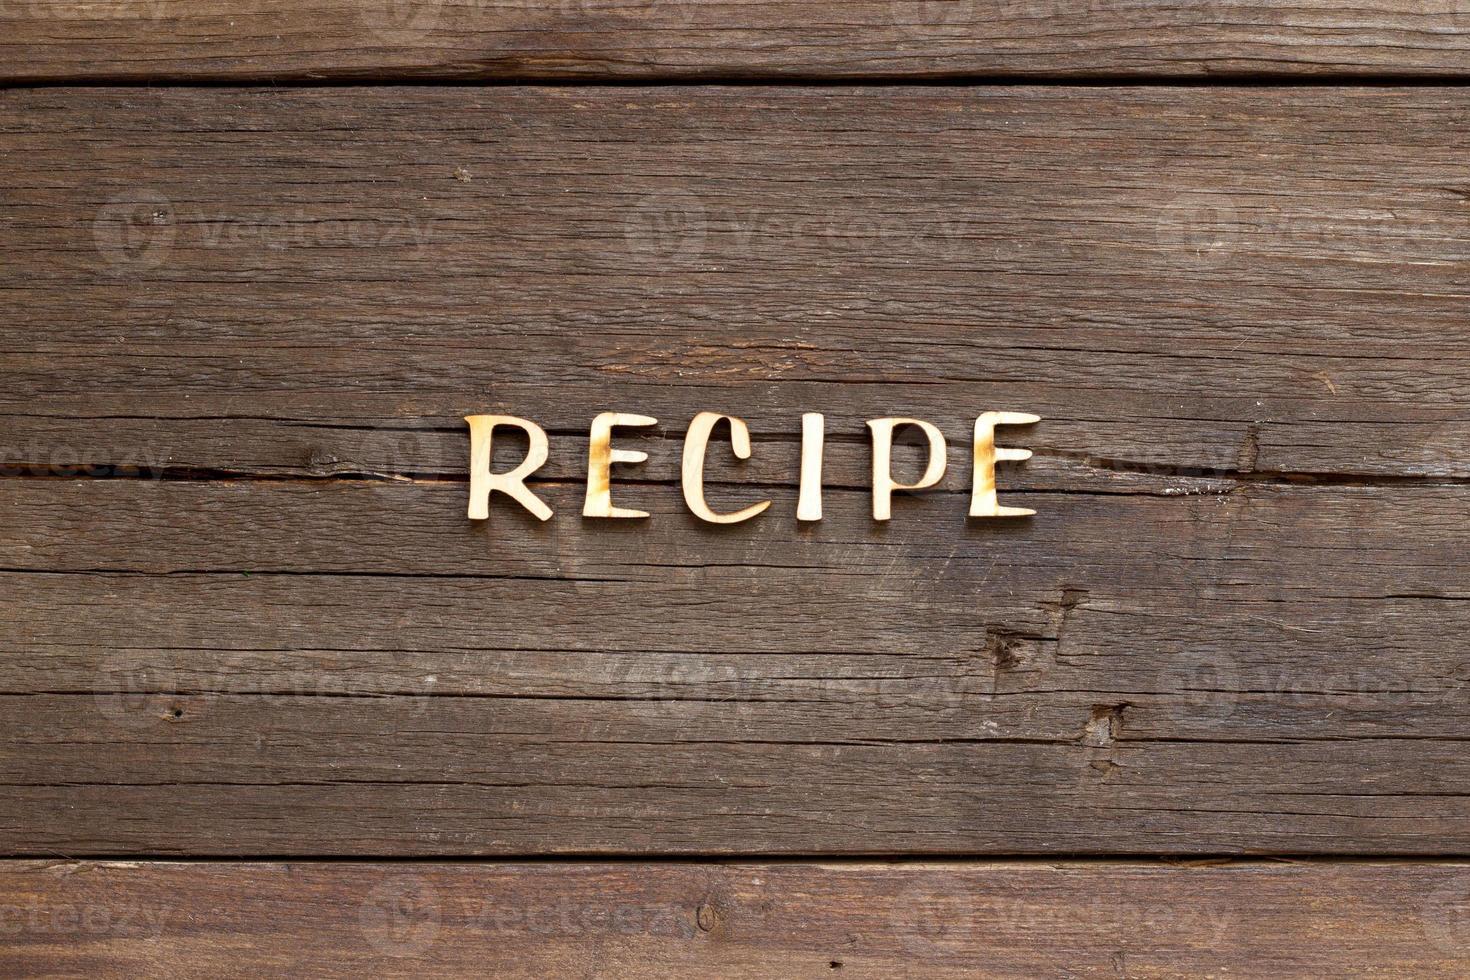 recepten woord foto